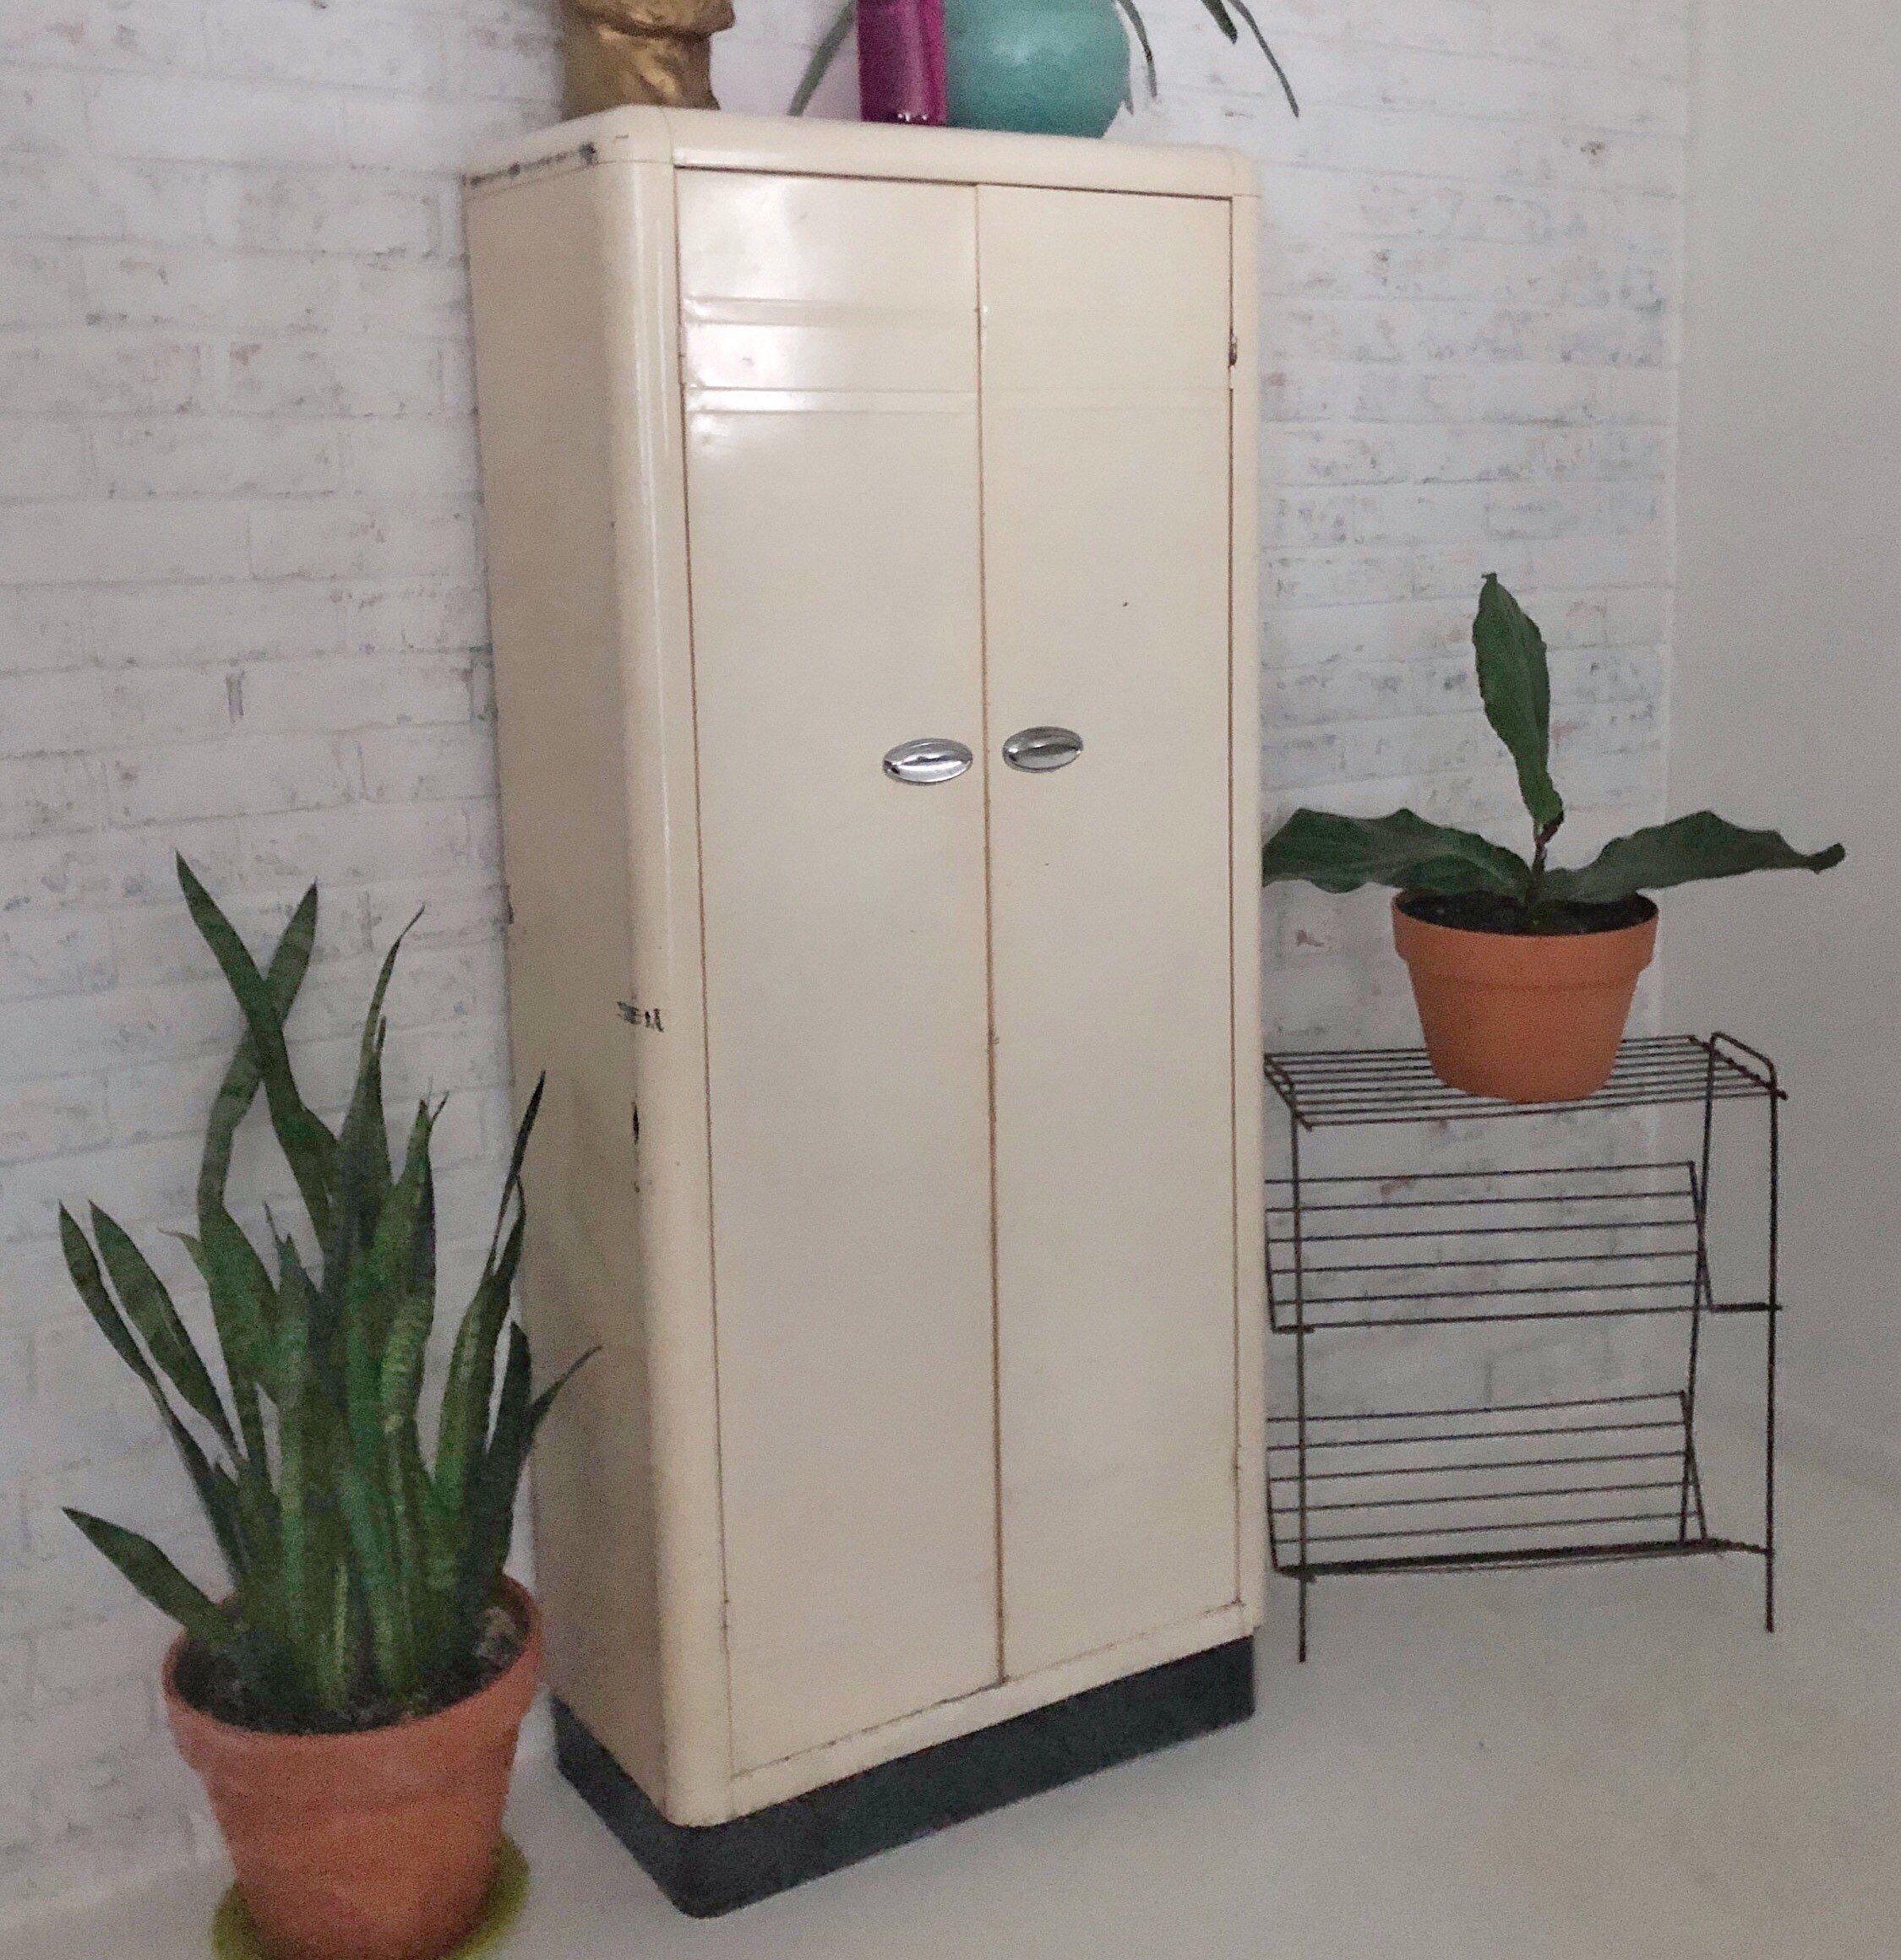 1940 S Art Deco Metal Cabinet 5 Shelves Industrial Storage Cream Color Black Base In 2020 Vintage Metal Cabinet Metal Cabinet Industrial Storage